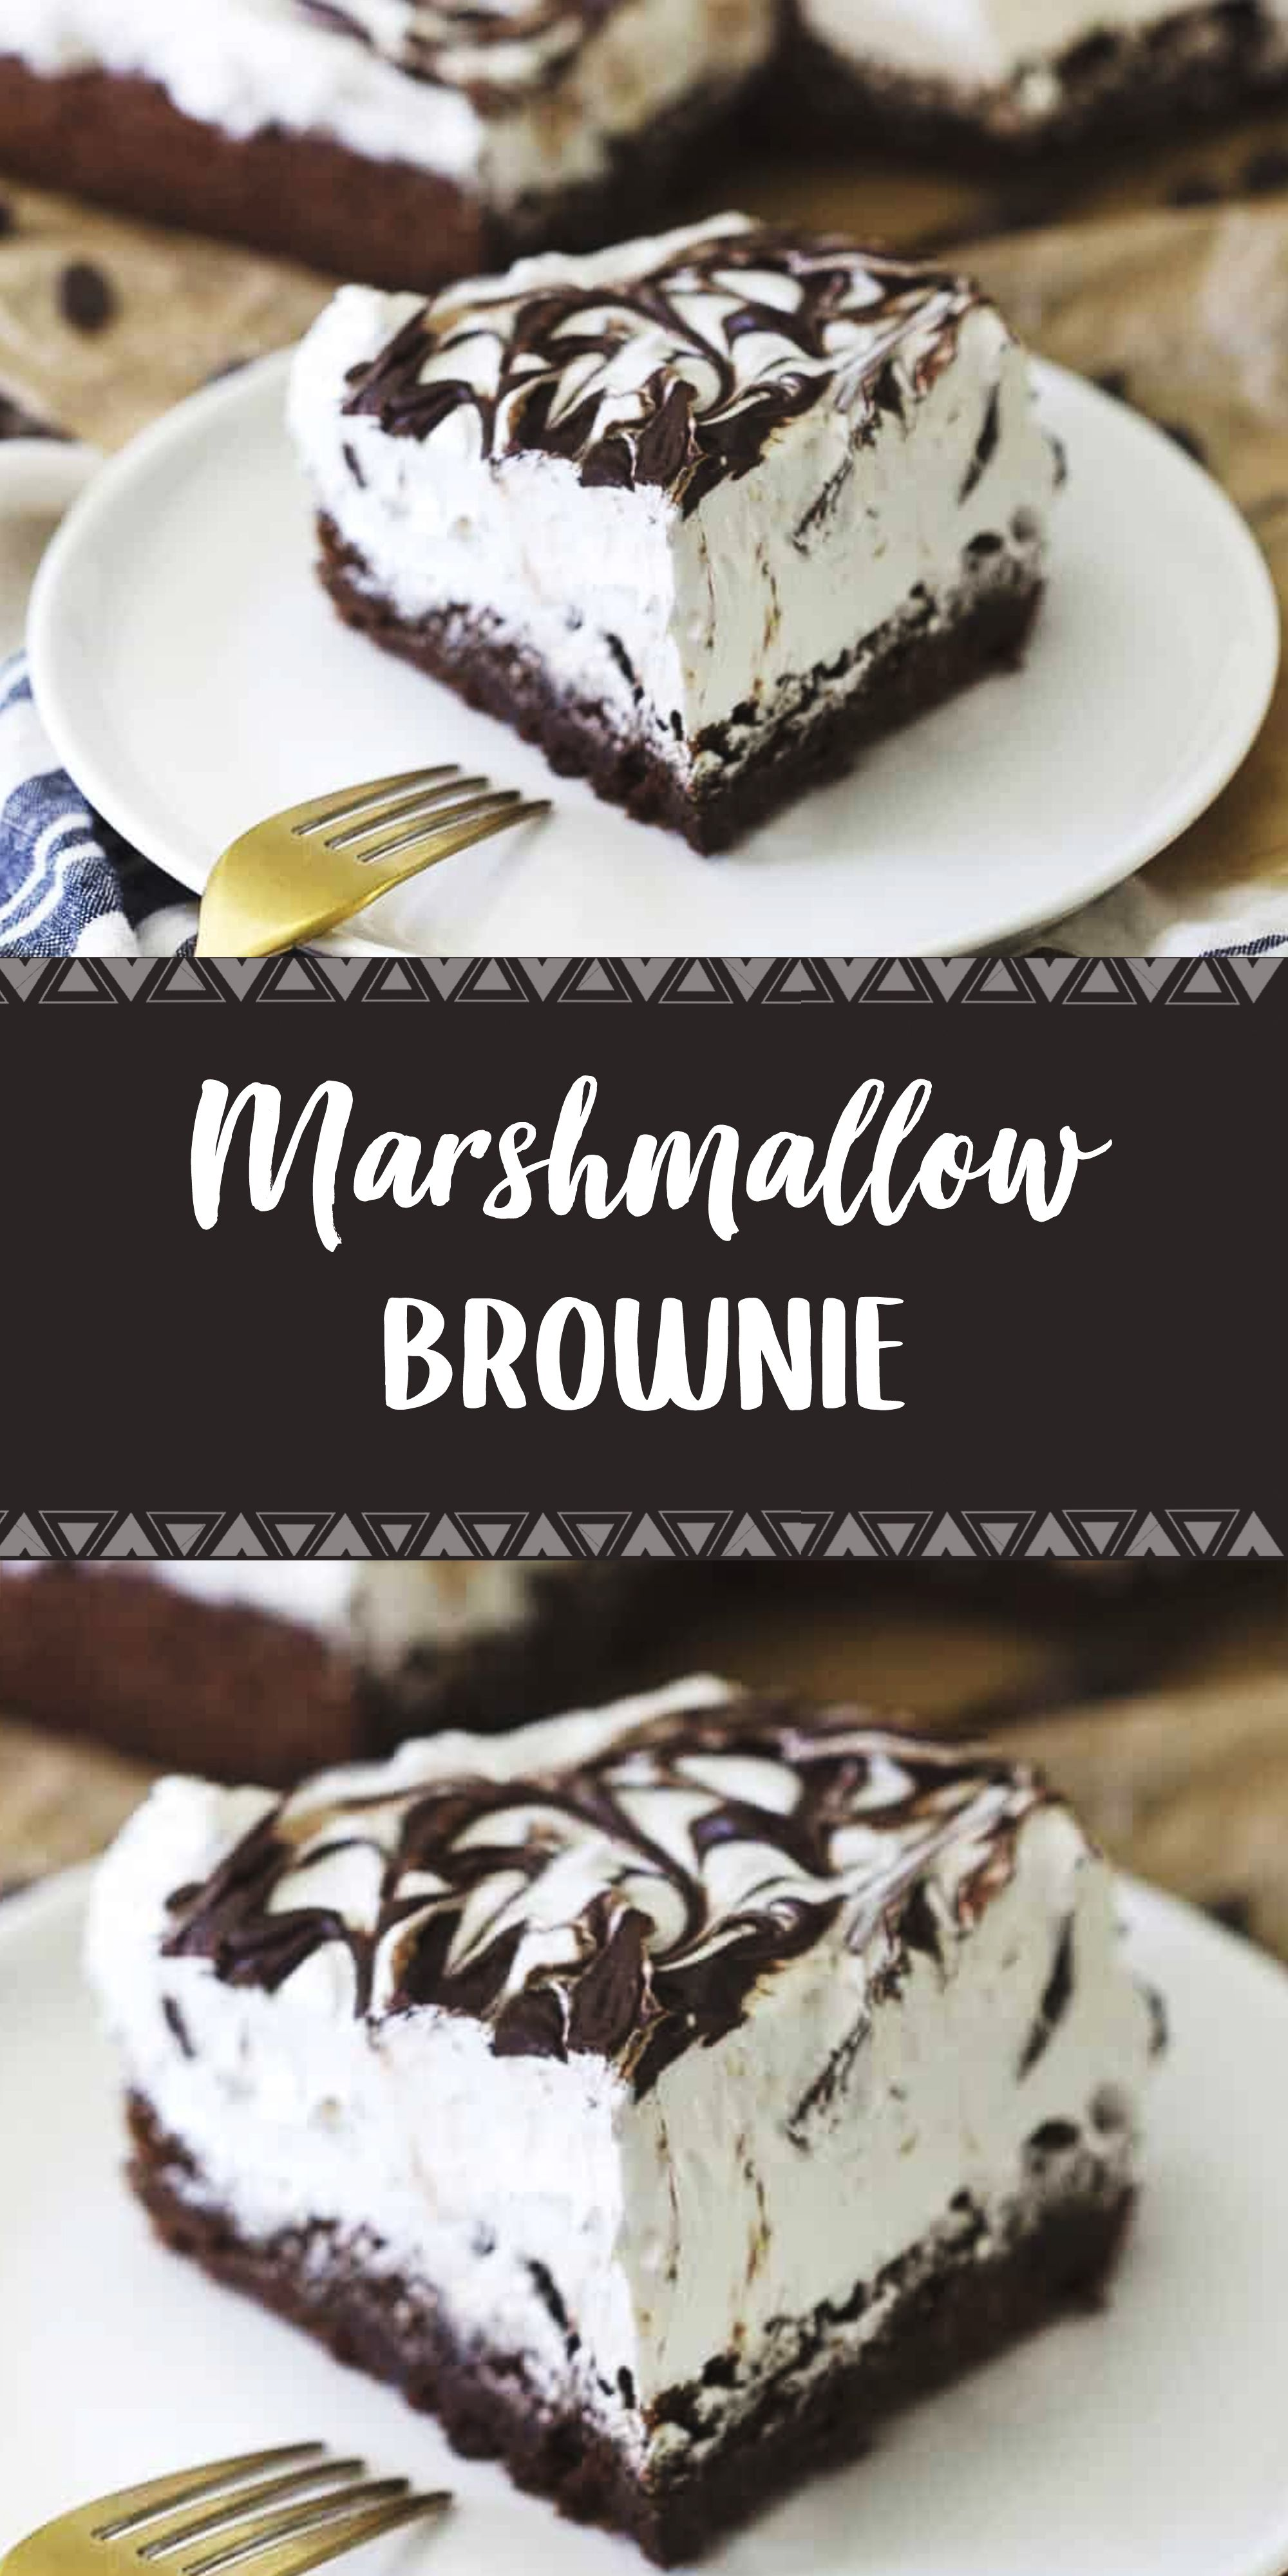 Marshmallow Brownie In 2020 Dessert Recipes Party Food Dessert